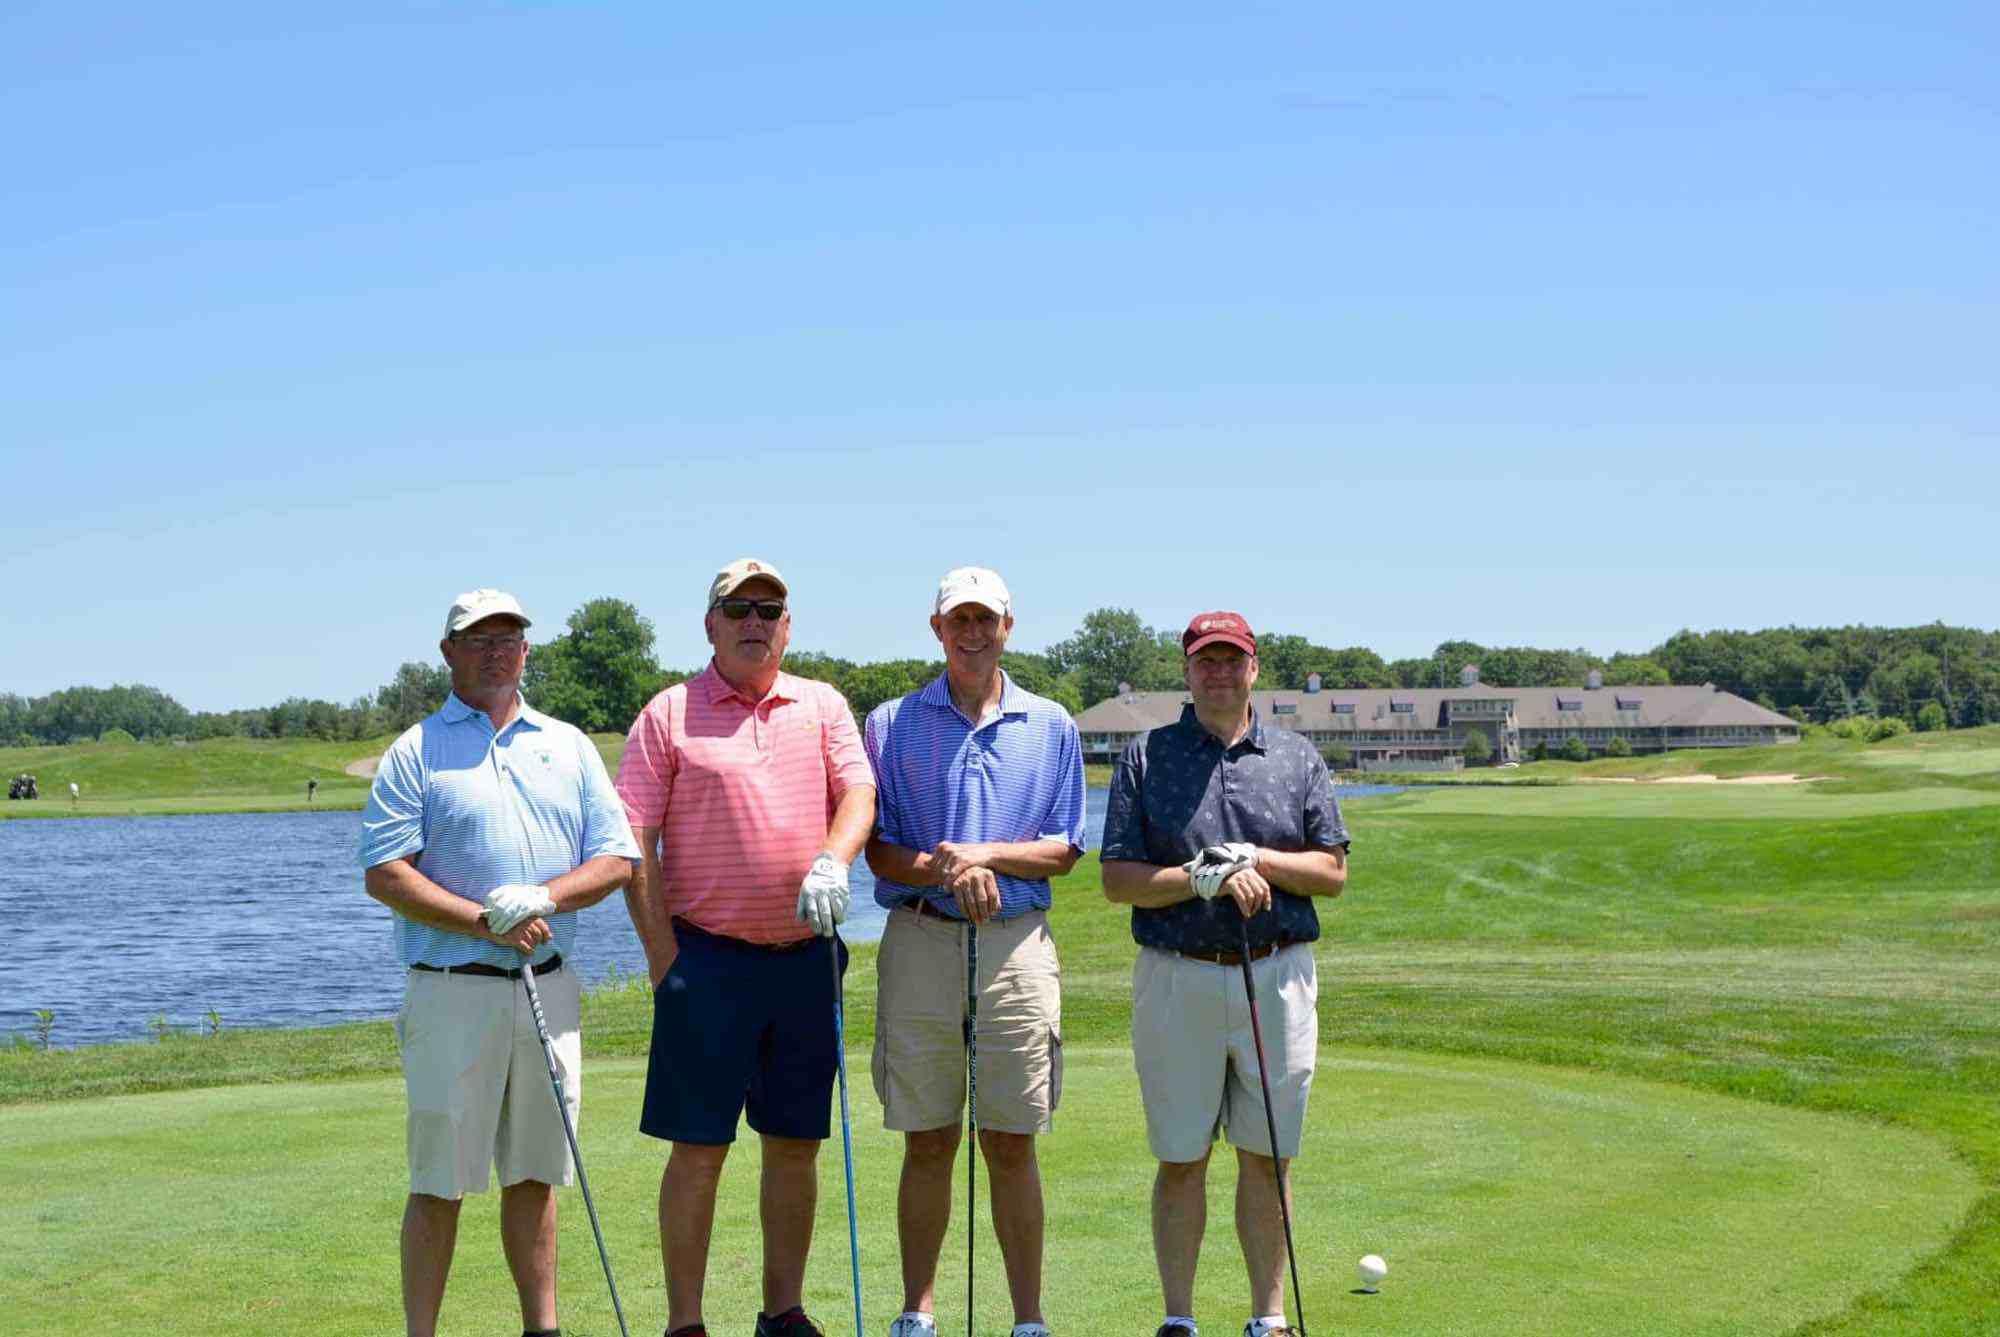 Golf Classic Team Winners - Lumbermen's